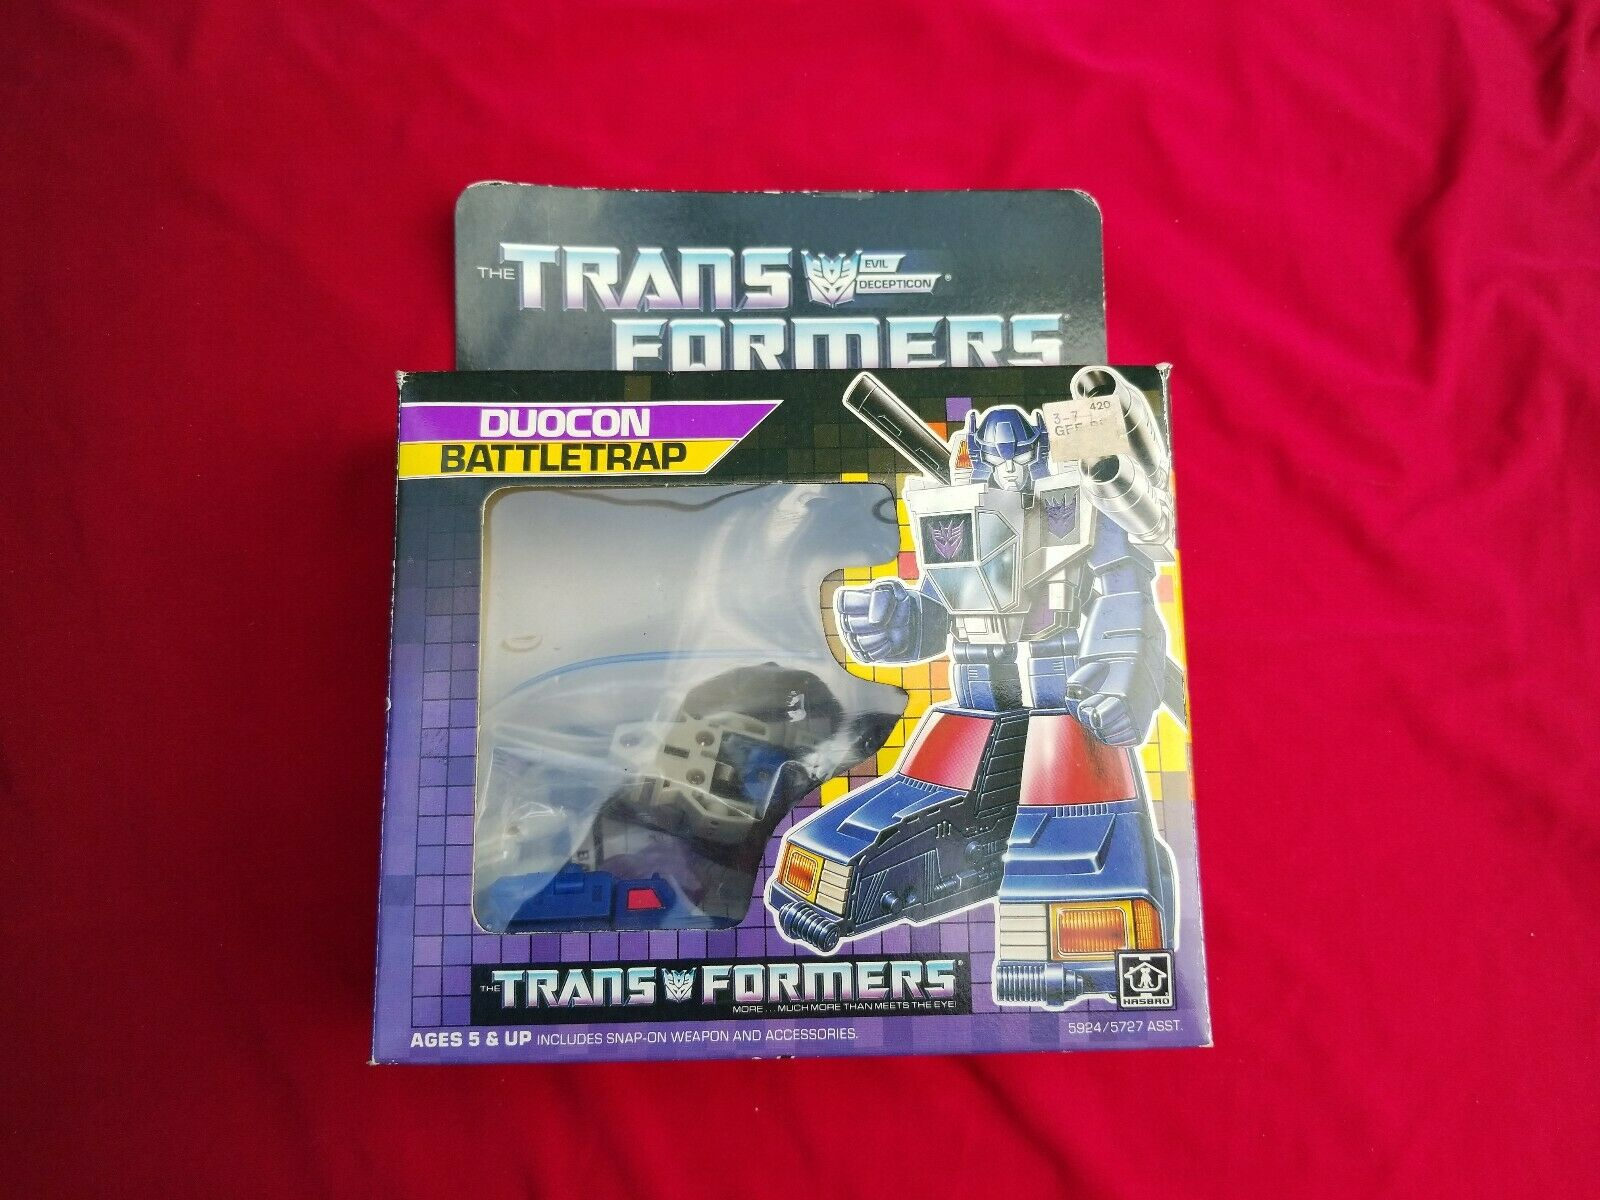 G1 transformers Decepticon duocon kämpfentrap complete with Box and manual